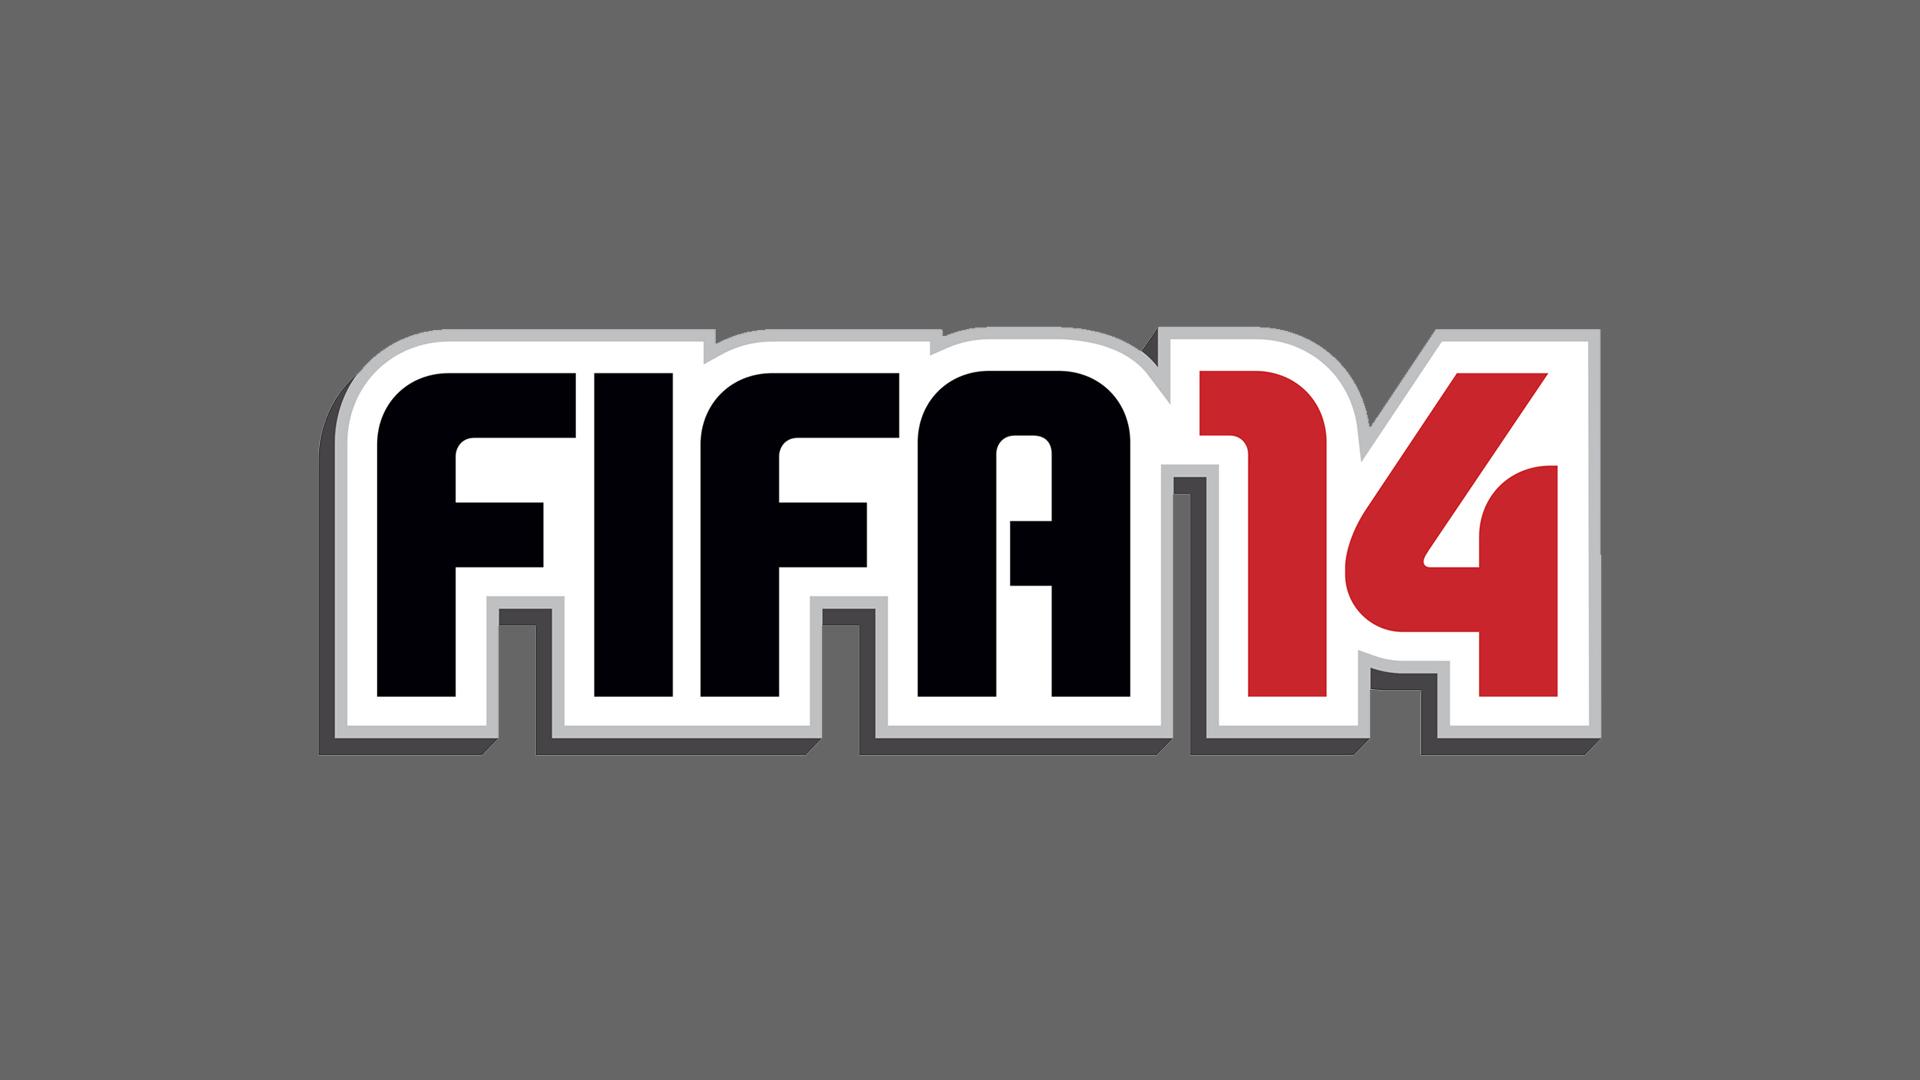 Fifa 14 logo wallpaper 23788 1920x1080 px hdwallsource fifa 14 logo wallpaper 23788 voltagebd Images